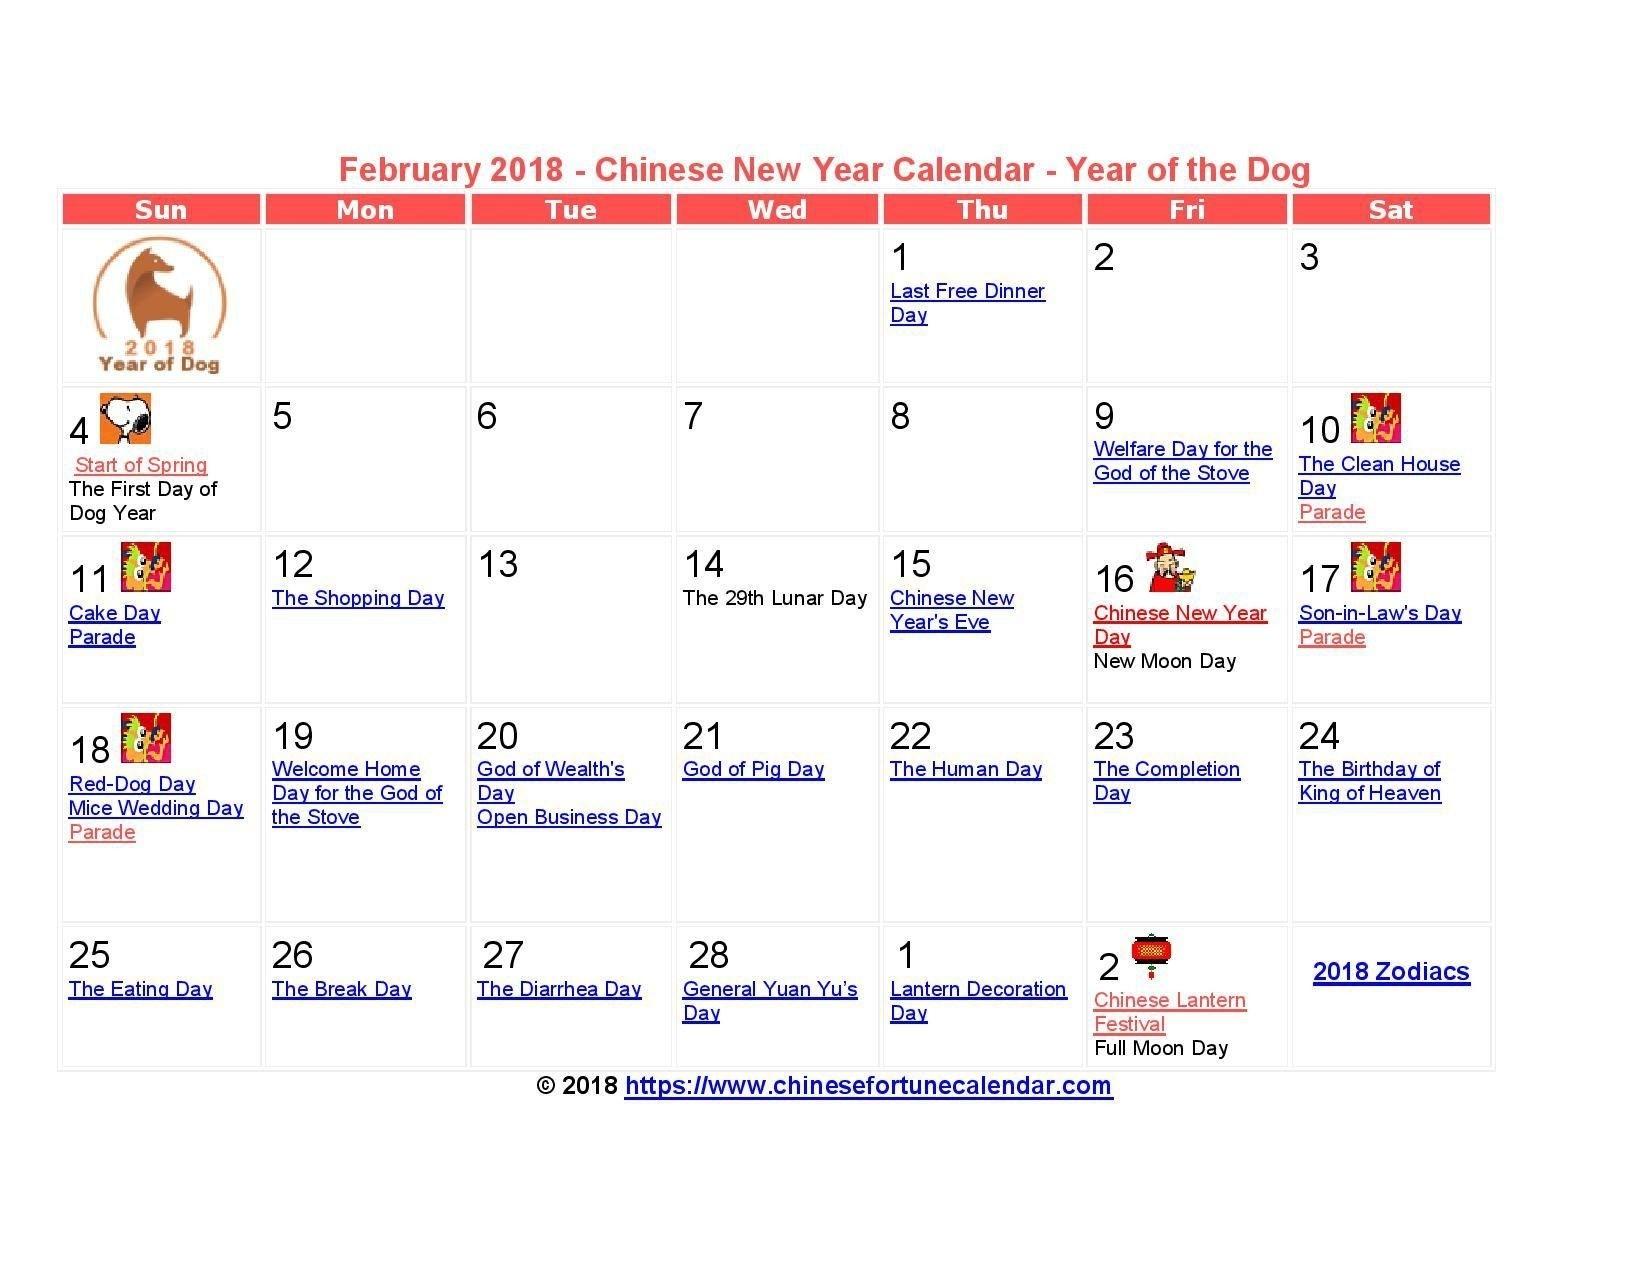 2019 March Calendar Kalnirnay Más Arriba-a-fecha Calendar 2018 Kuda Of 2019 March Calendar Kalnirnay Más Actual Tithi 2018 Holidays Calendar 2019 Que